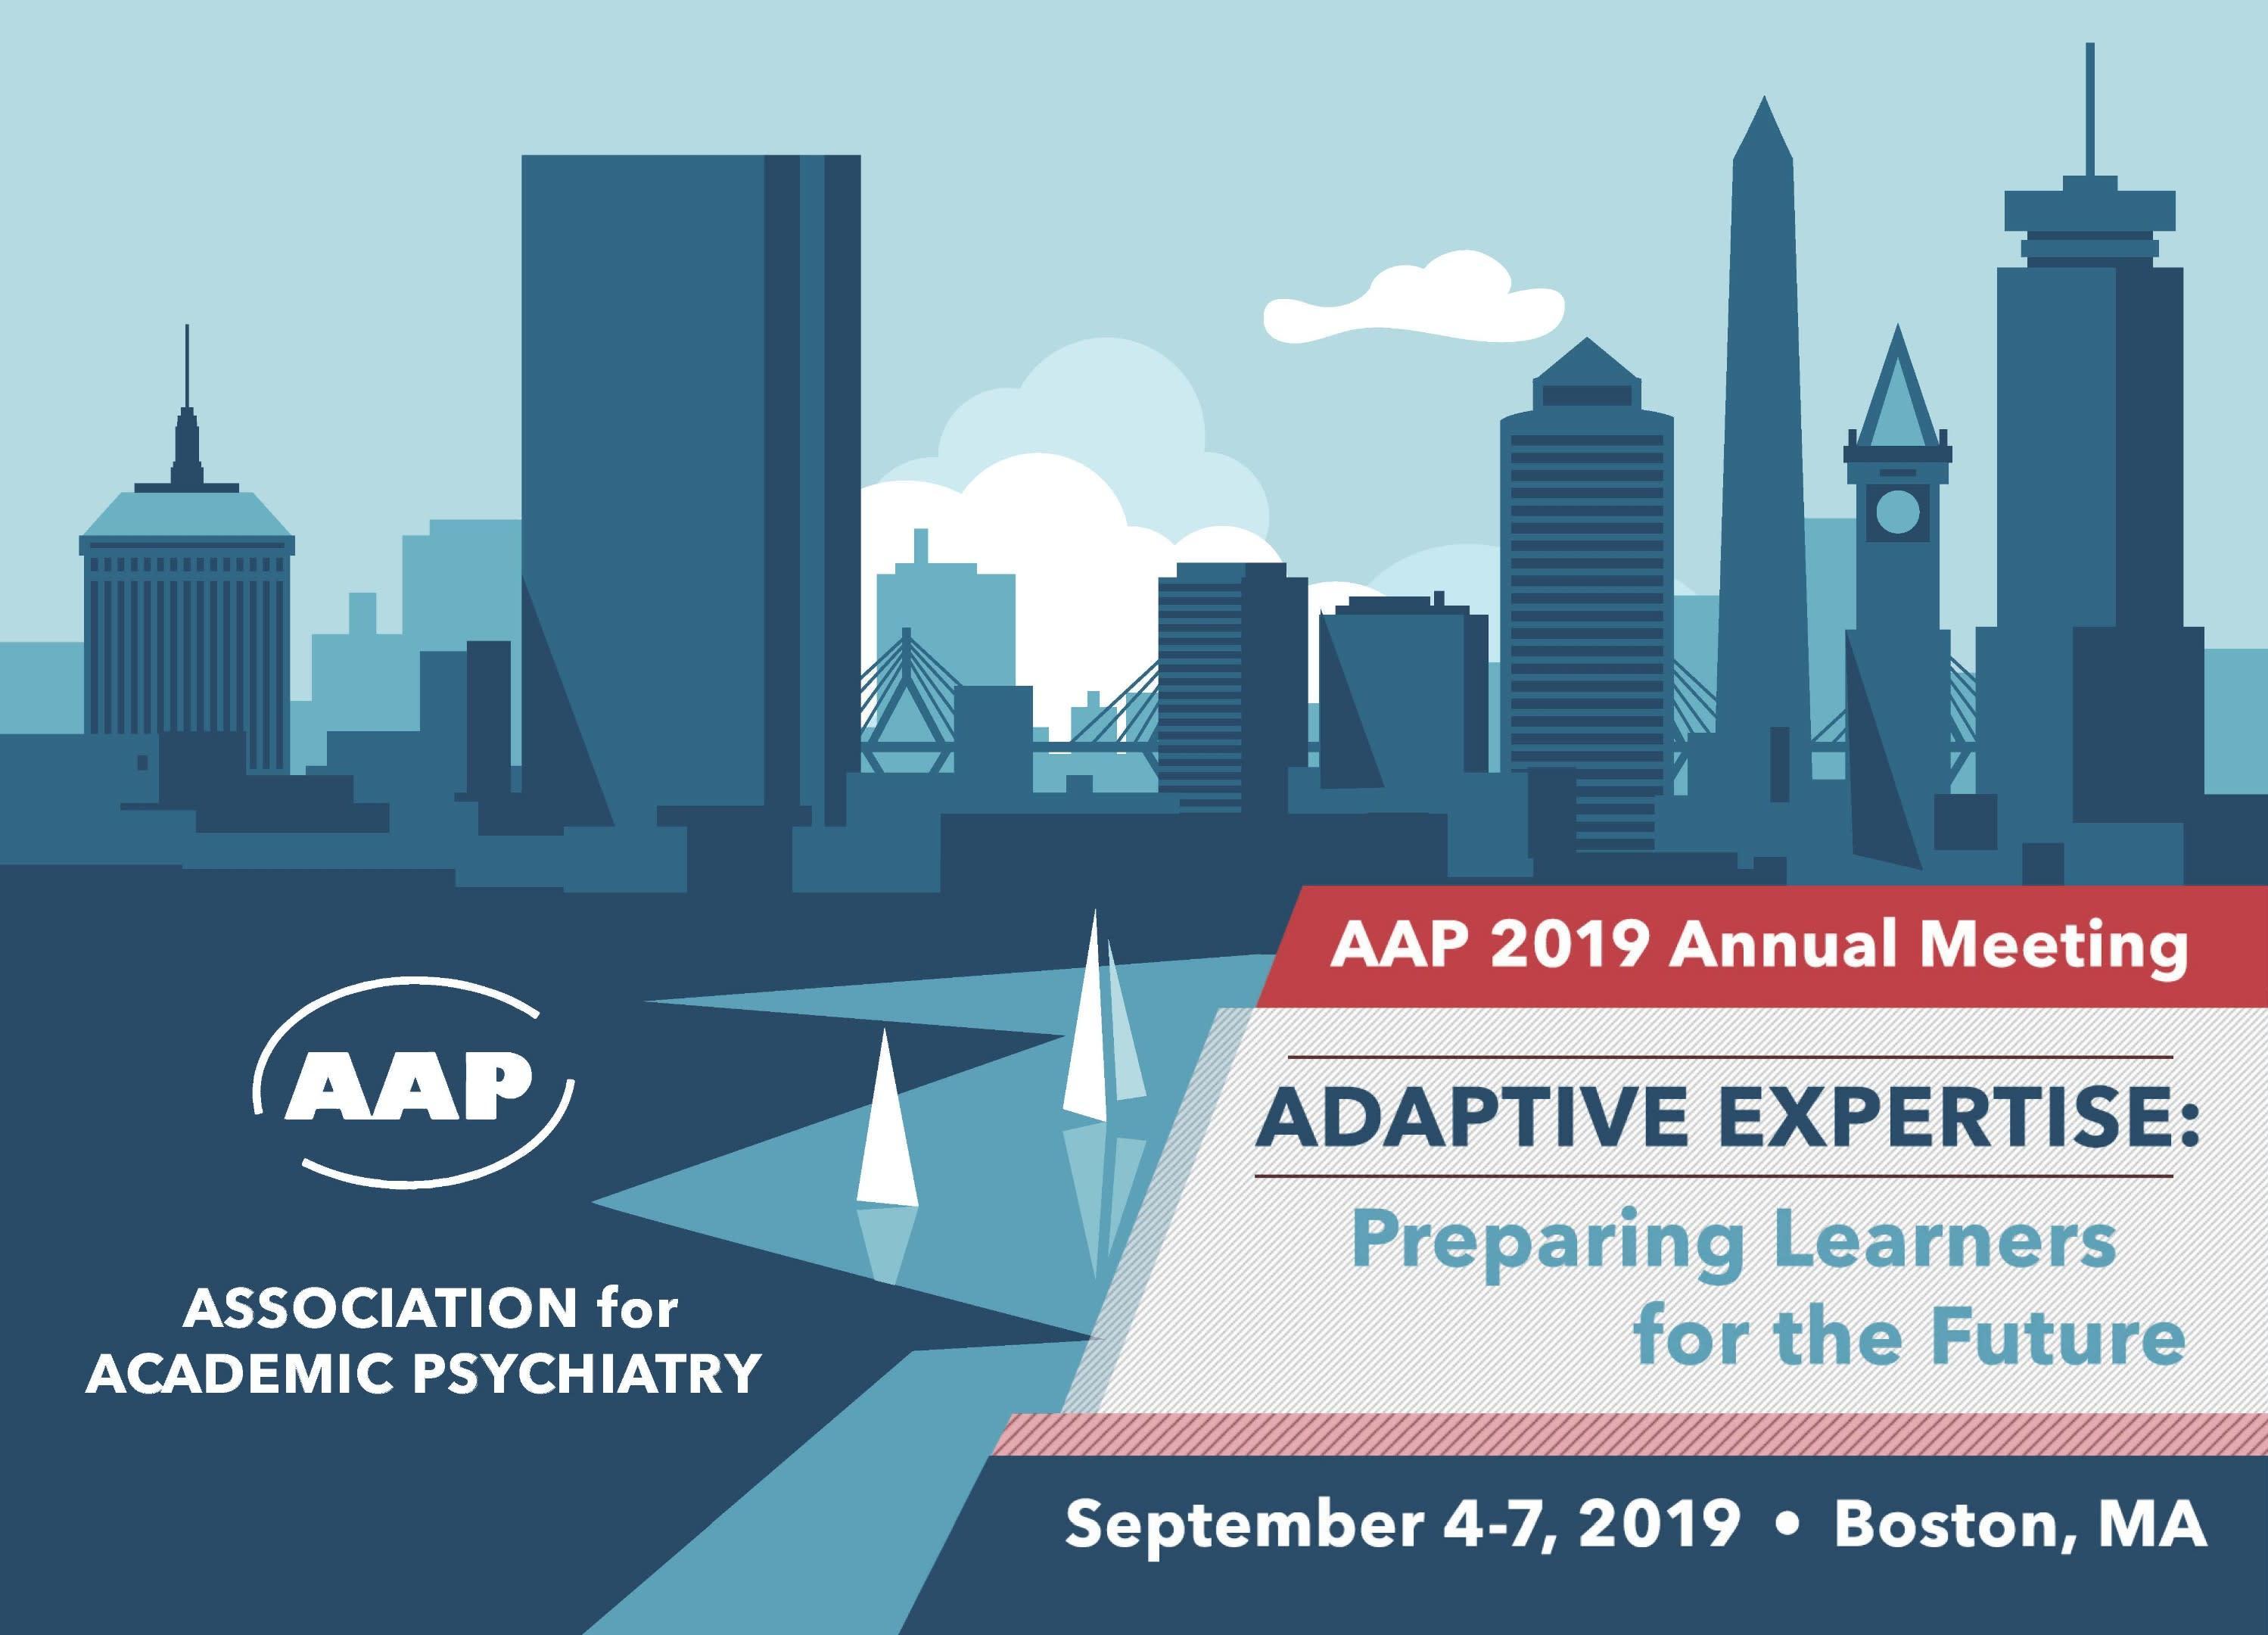 Association for Academic Psychiatry (AAP)